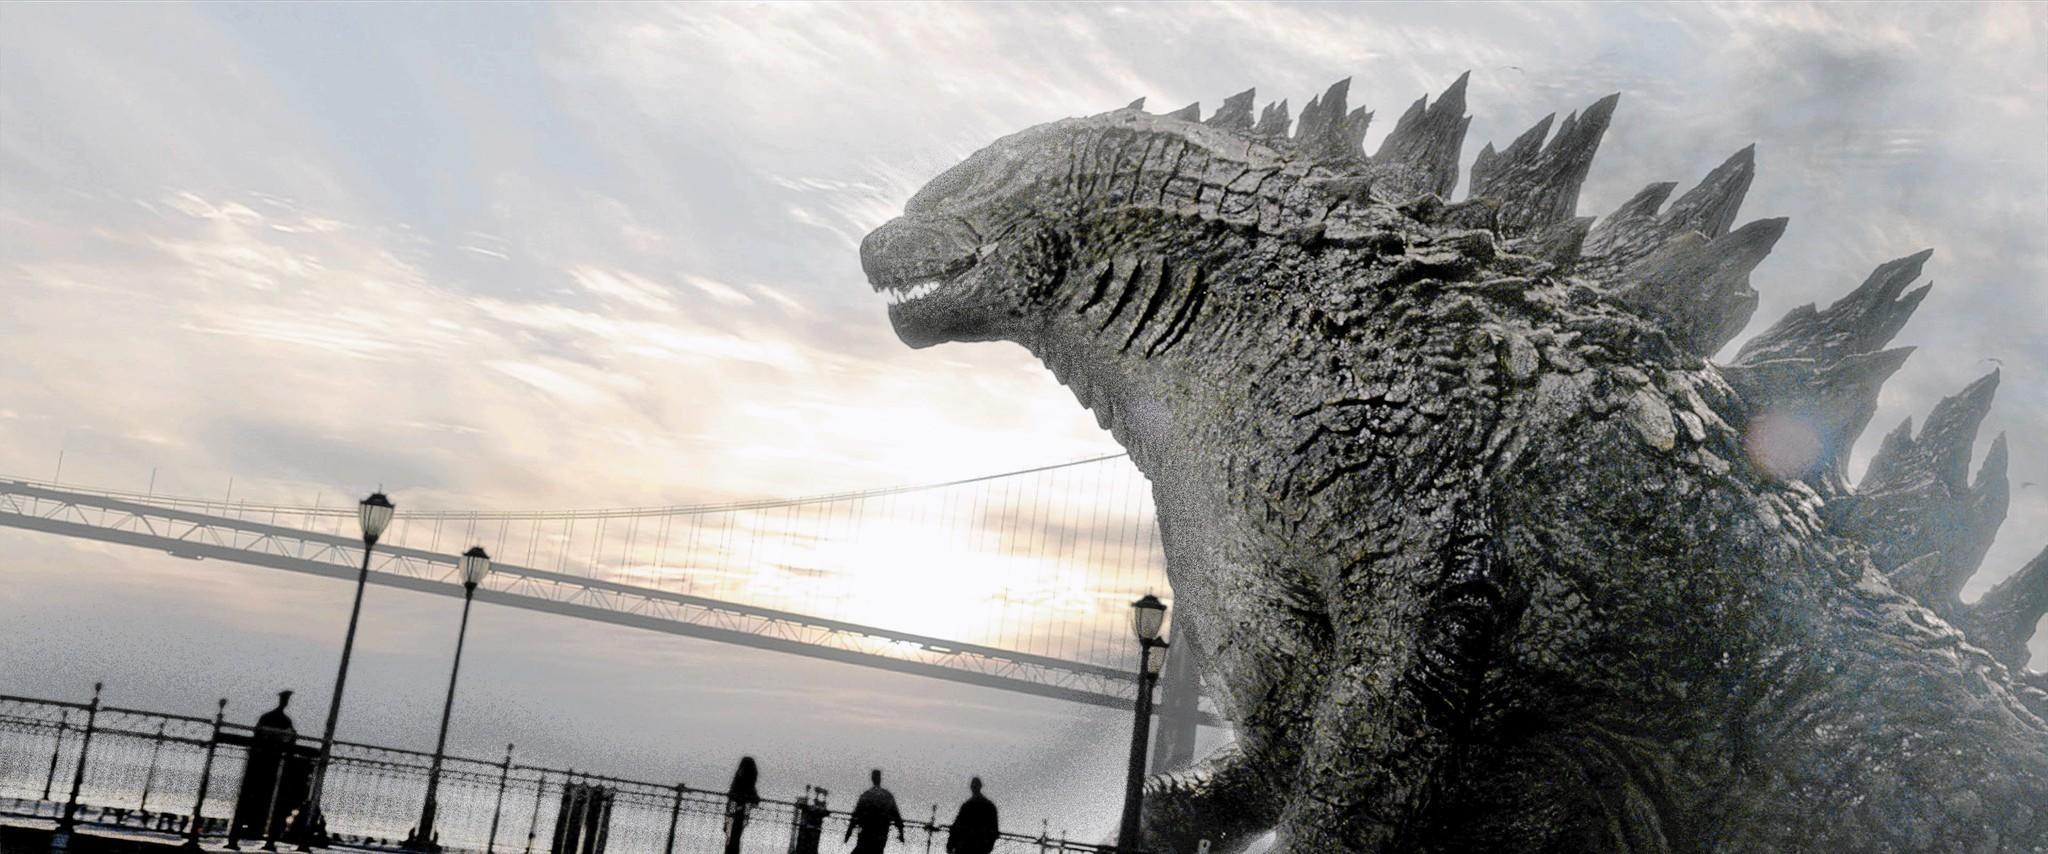 The new Godzilla